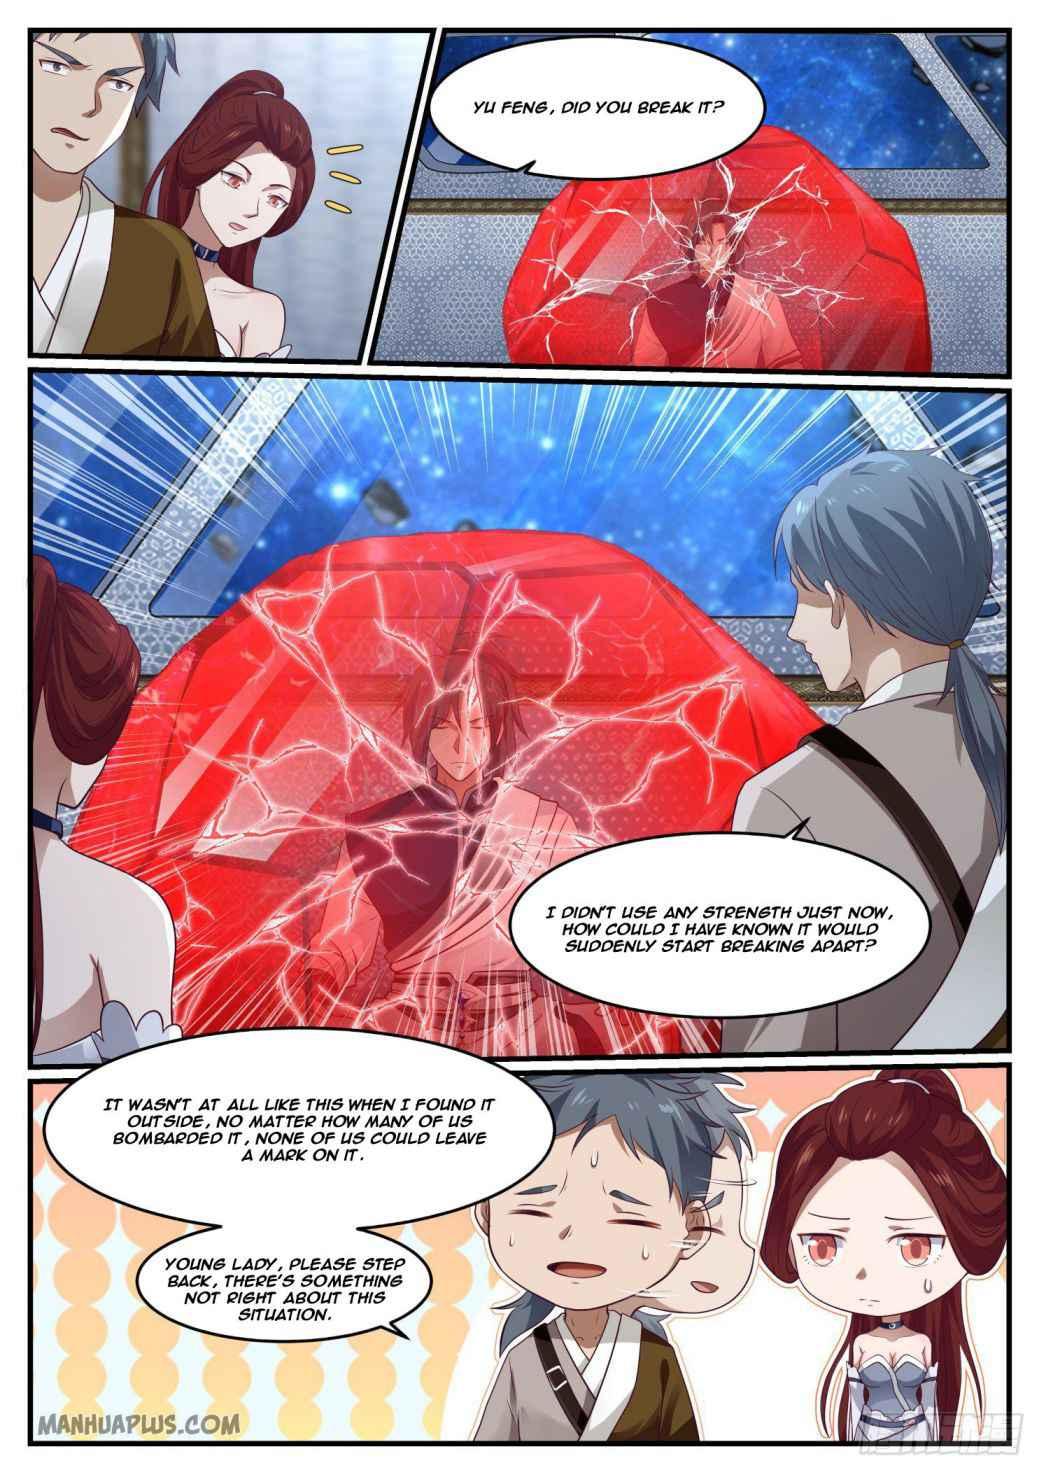 Martial Peak - chapter 980-eng-li